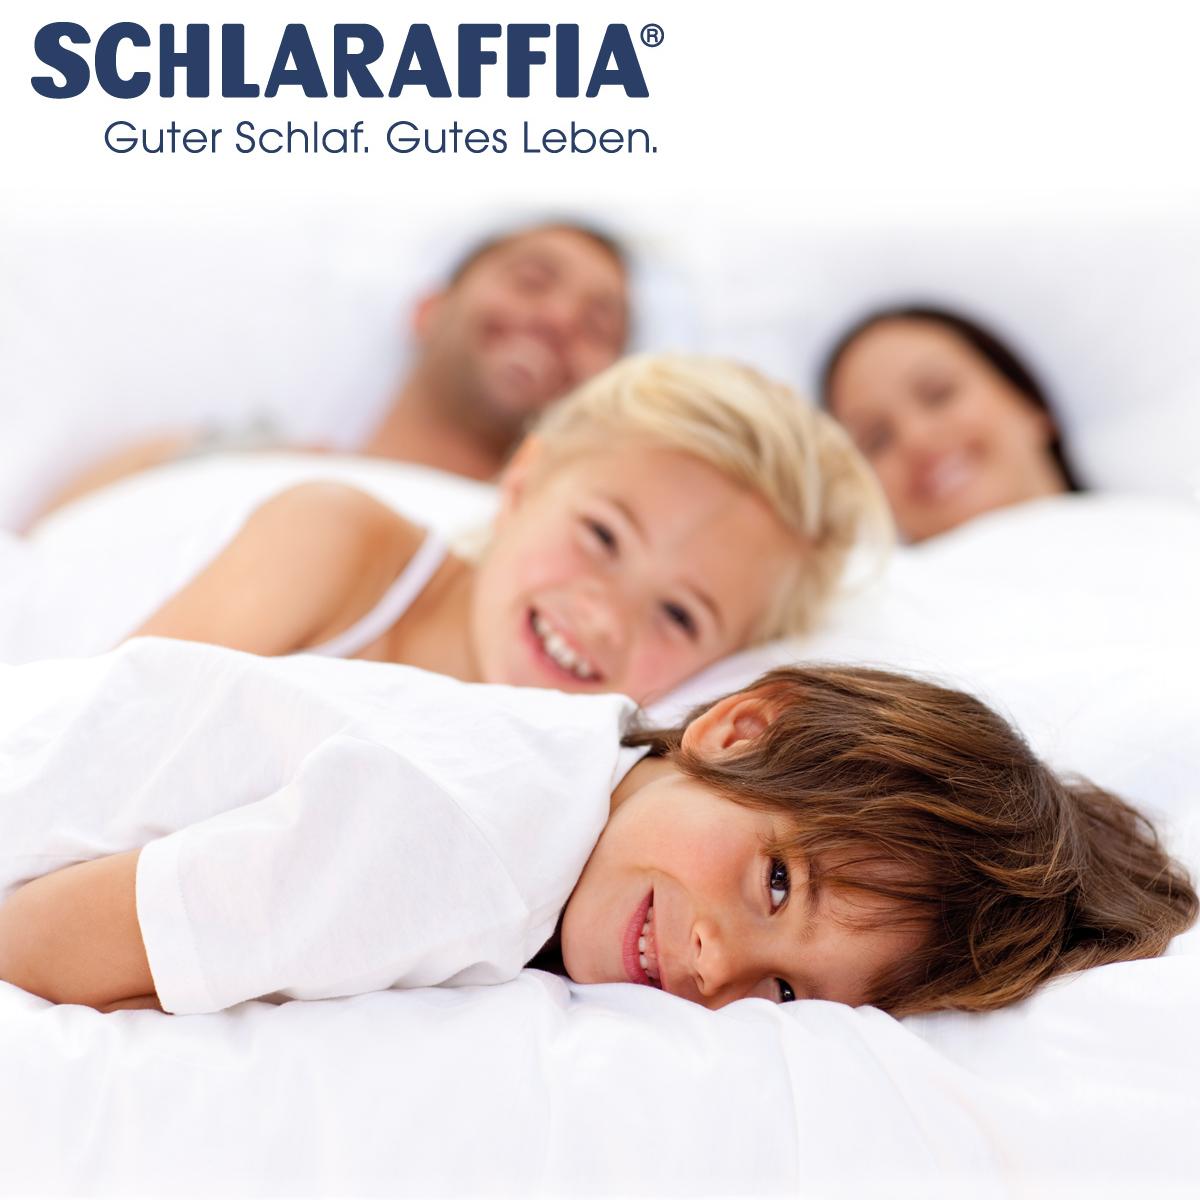 schlaraffia sky 200 bultex matratze 160x190 cm h2 matratzen nach gr e sondergr en 160 x 190 cm. Black Bedroom Furniture Sets. Home Design Ideas